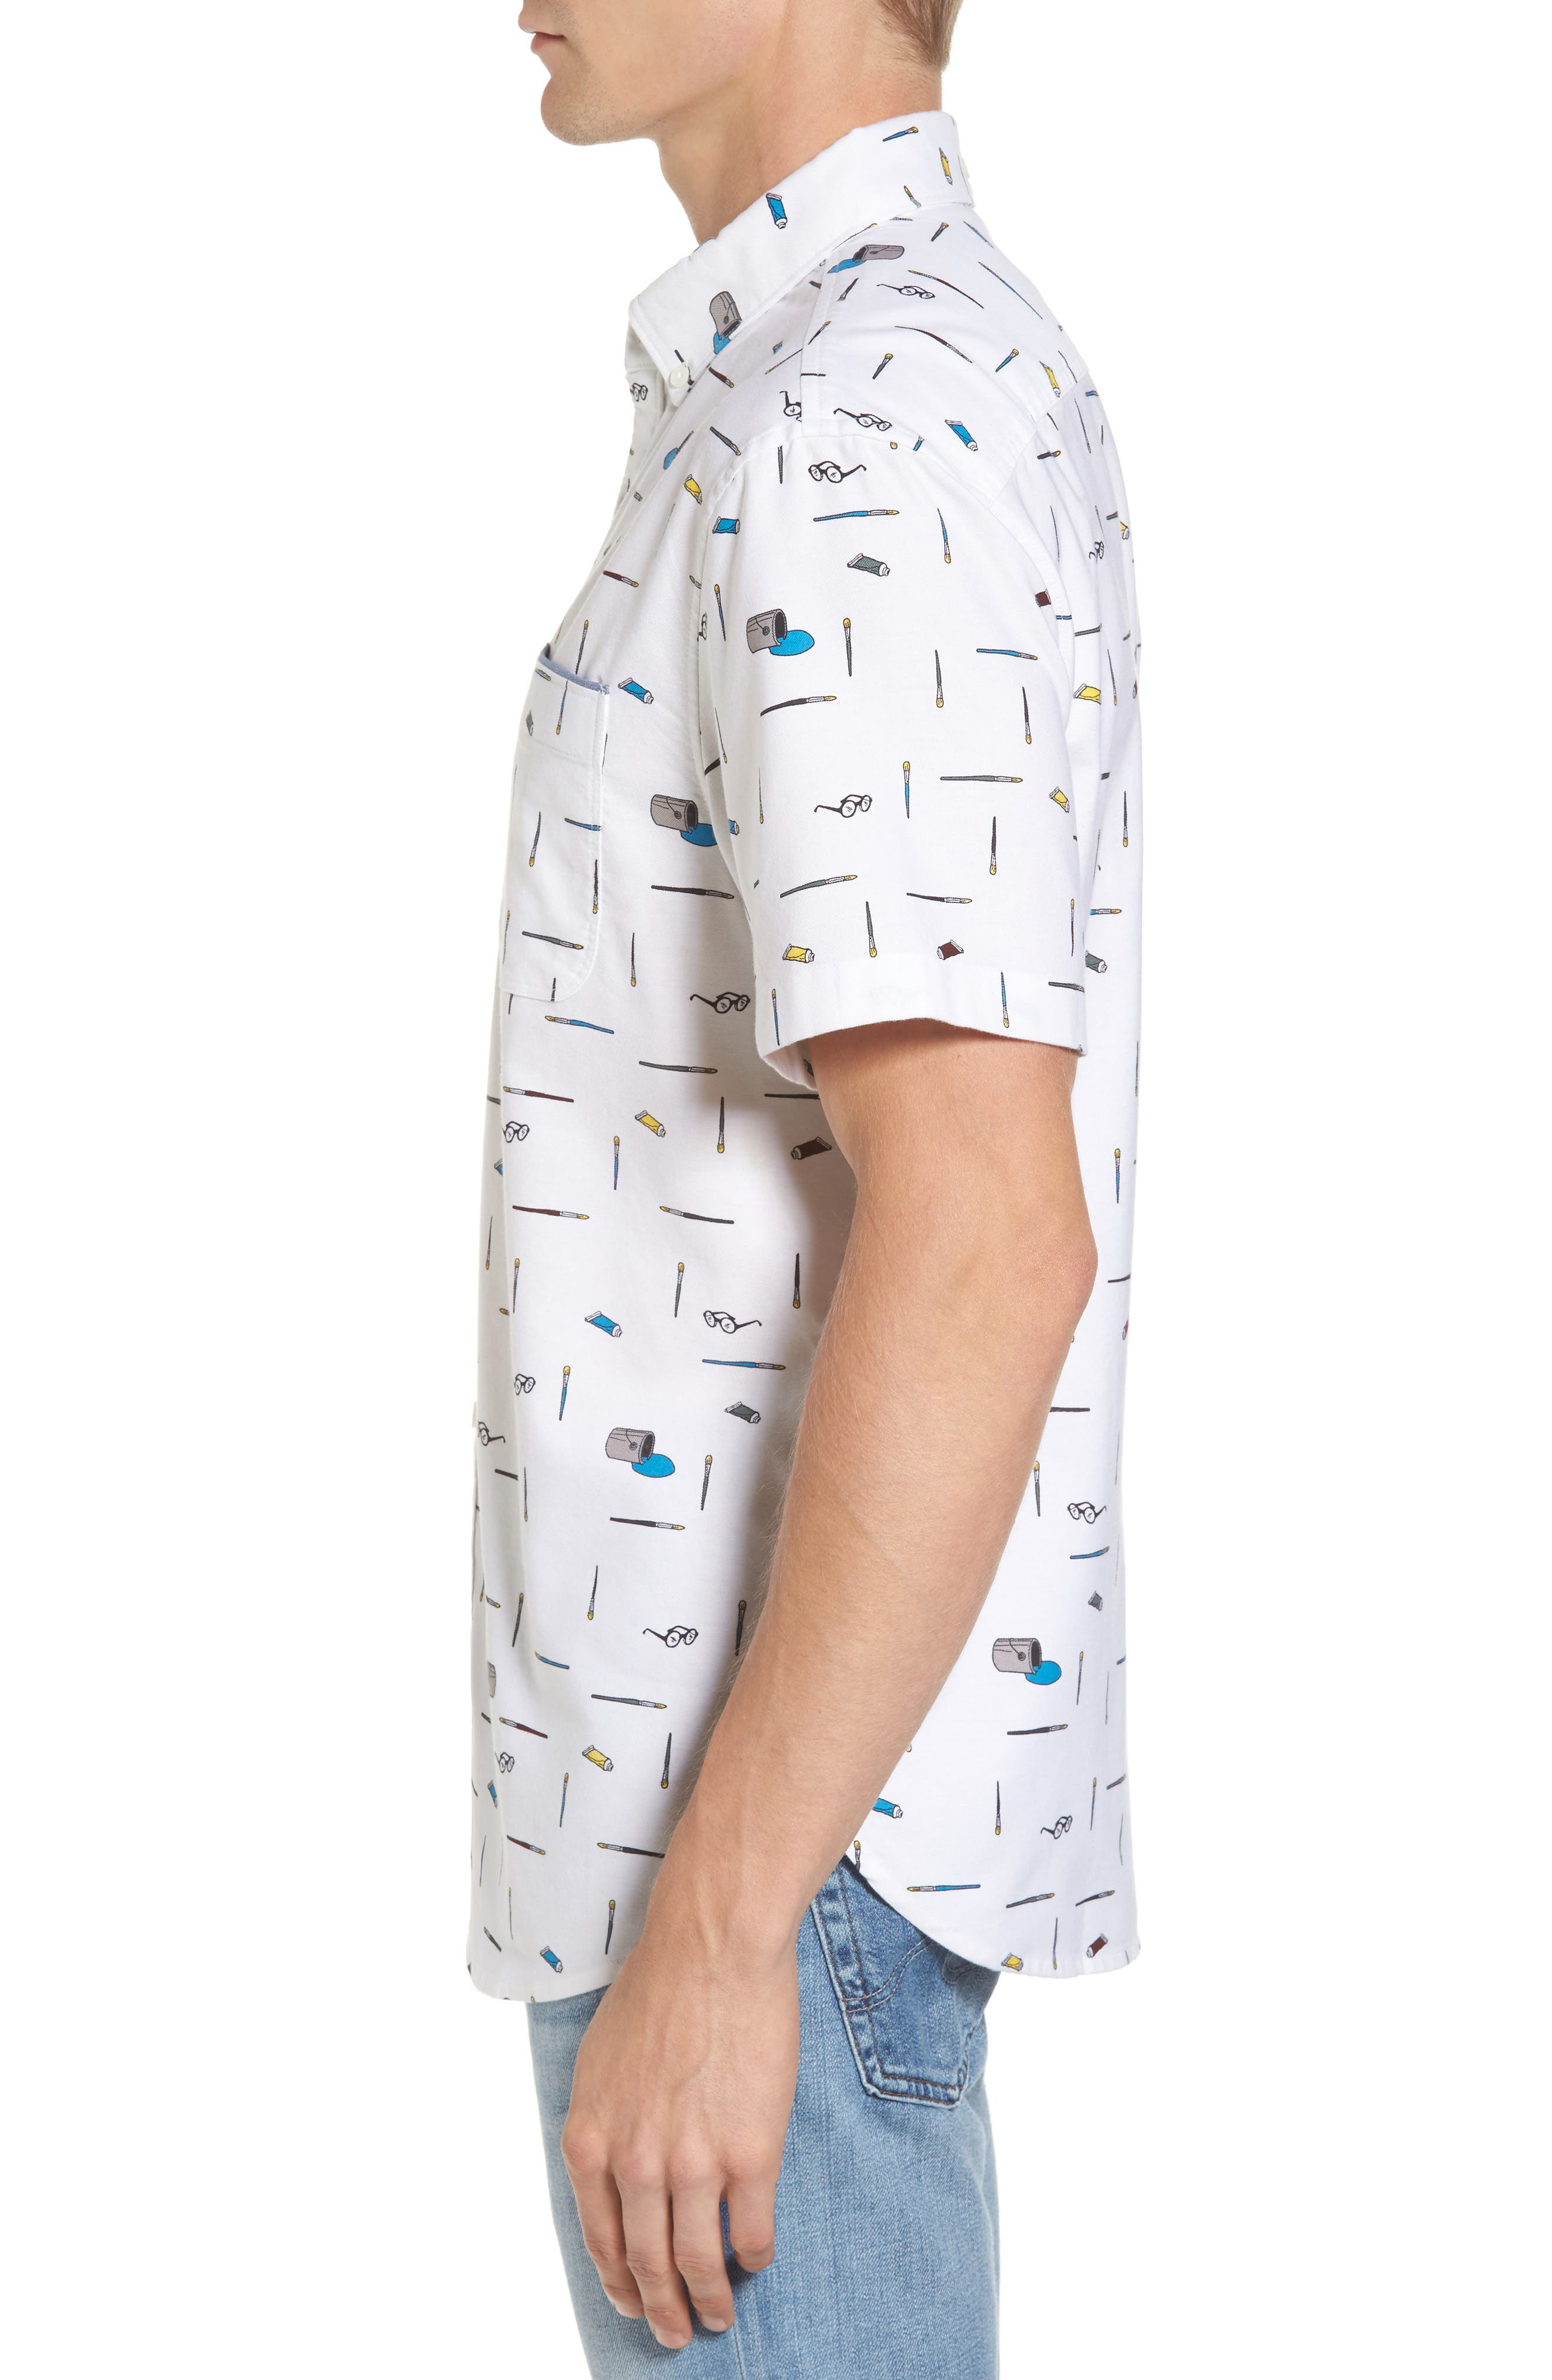 Paintbrush Pattern Woven Shirt,                             Alternate thumbnail 3, color,                             Bright White